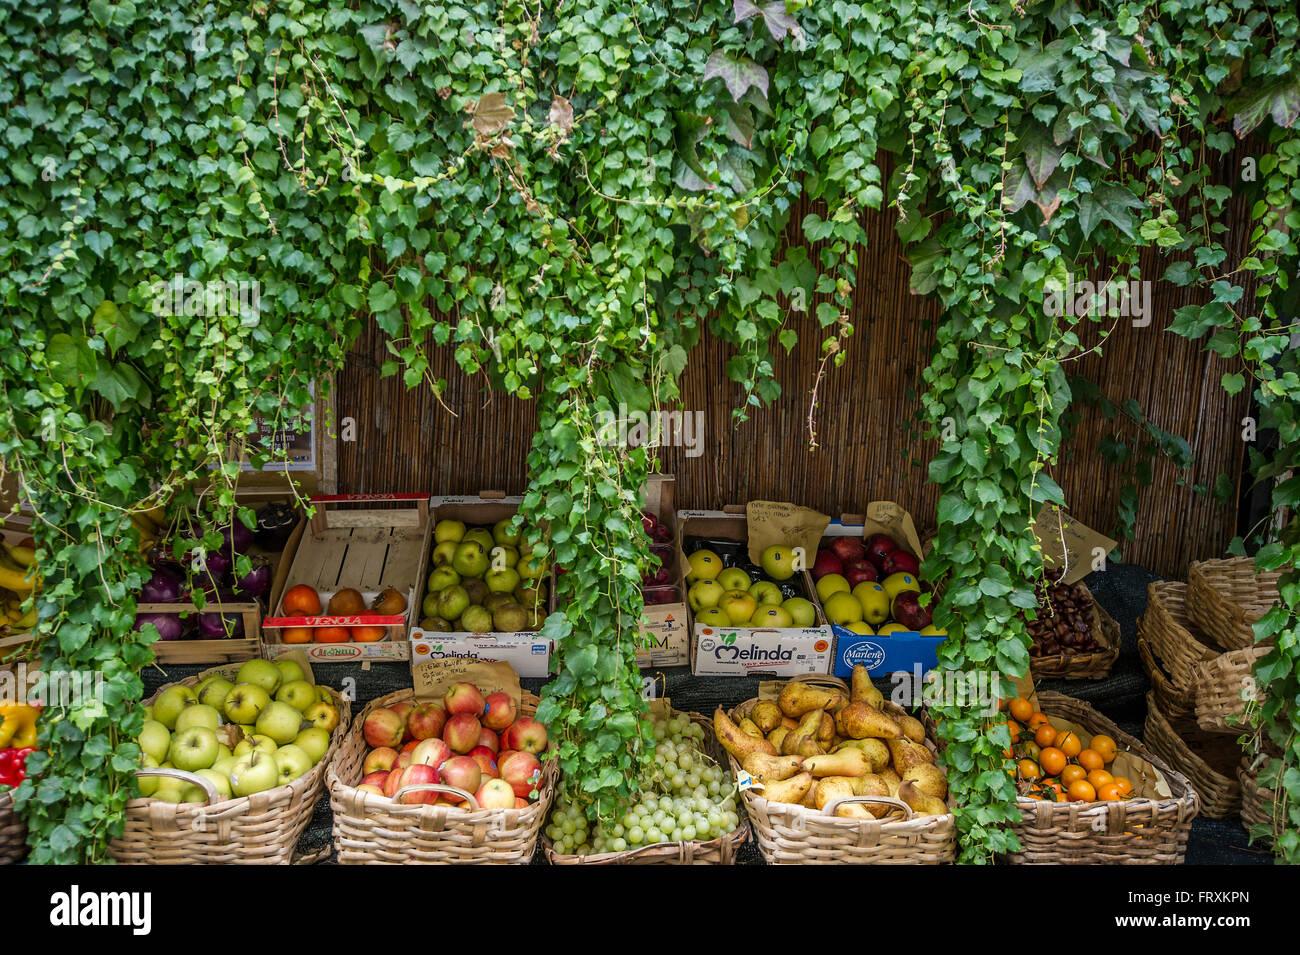 Fruit stall, Finalborgo, Finale Ligure, Province of Savona, Liguria, Italy - Stock Image